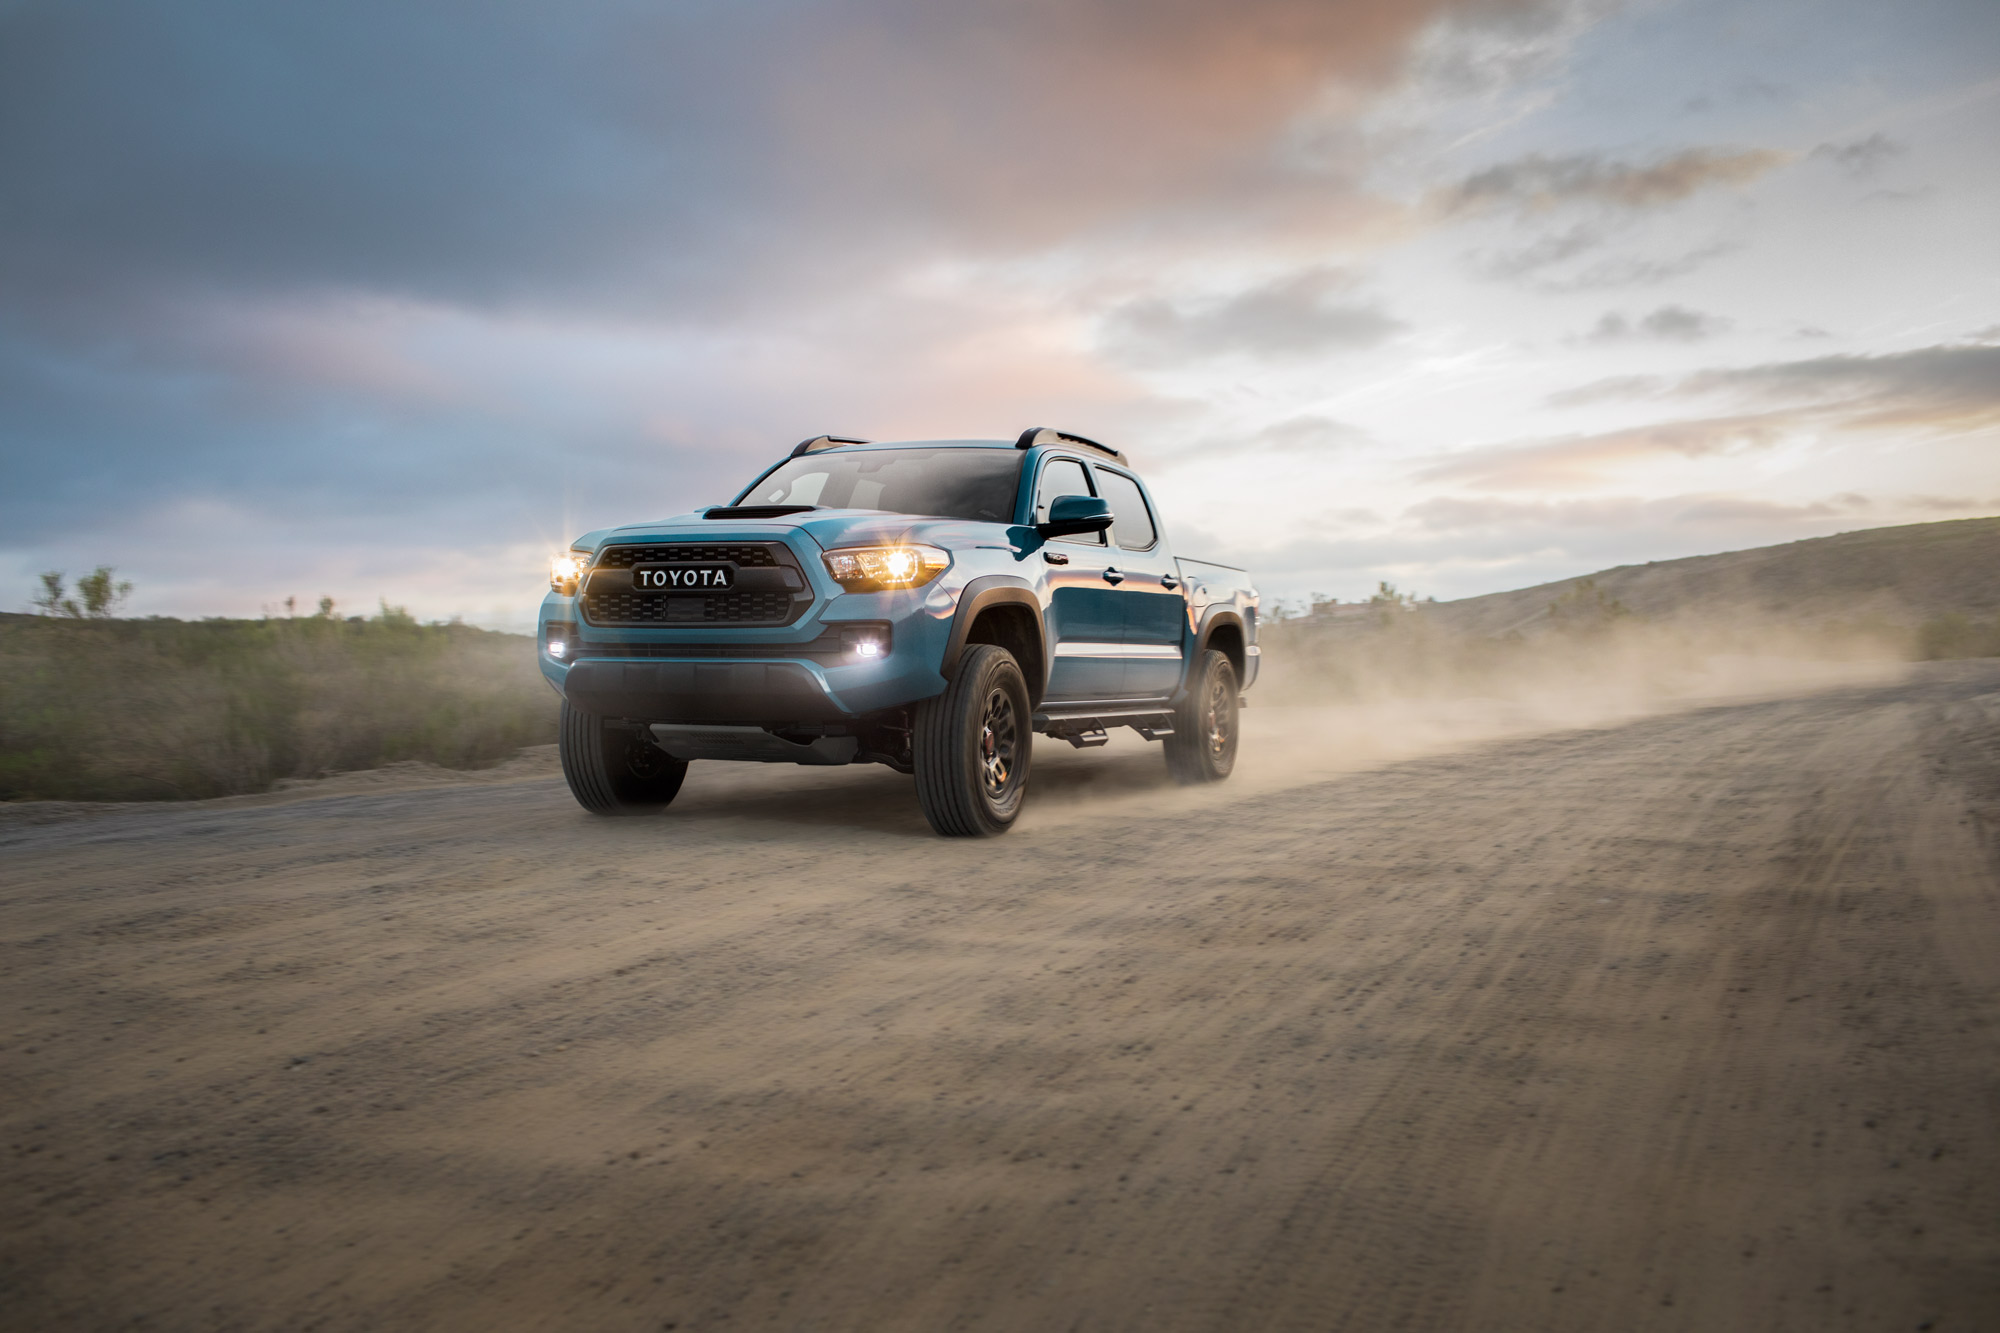 lou-mora-automotive-lifestyle-toyota-tacoma-pro-012.jpg